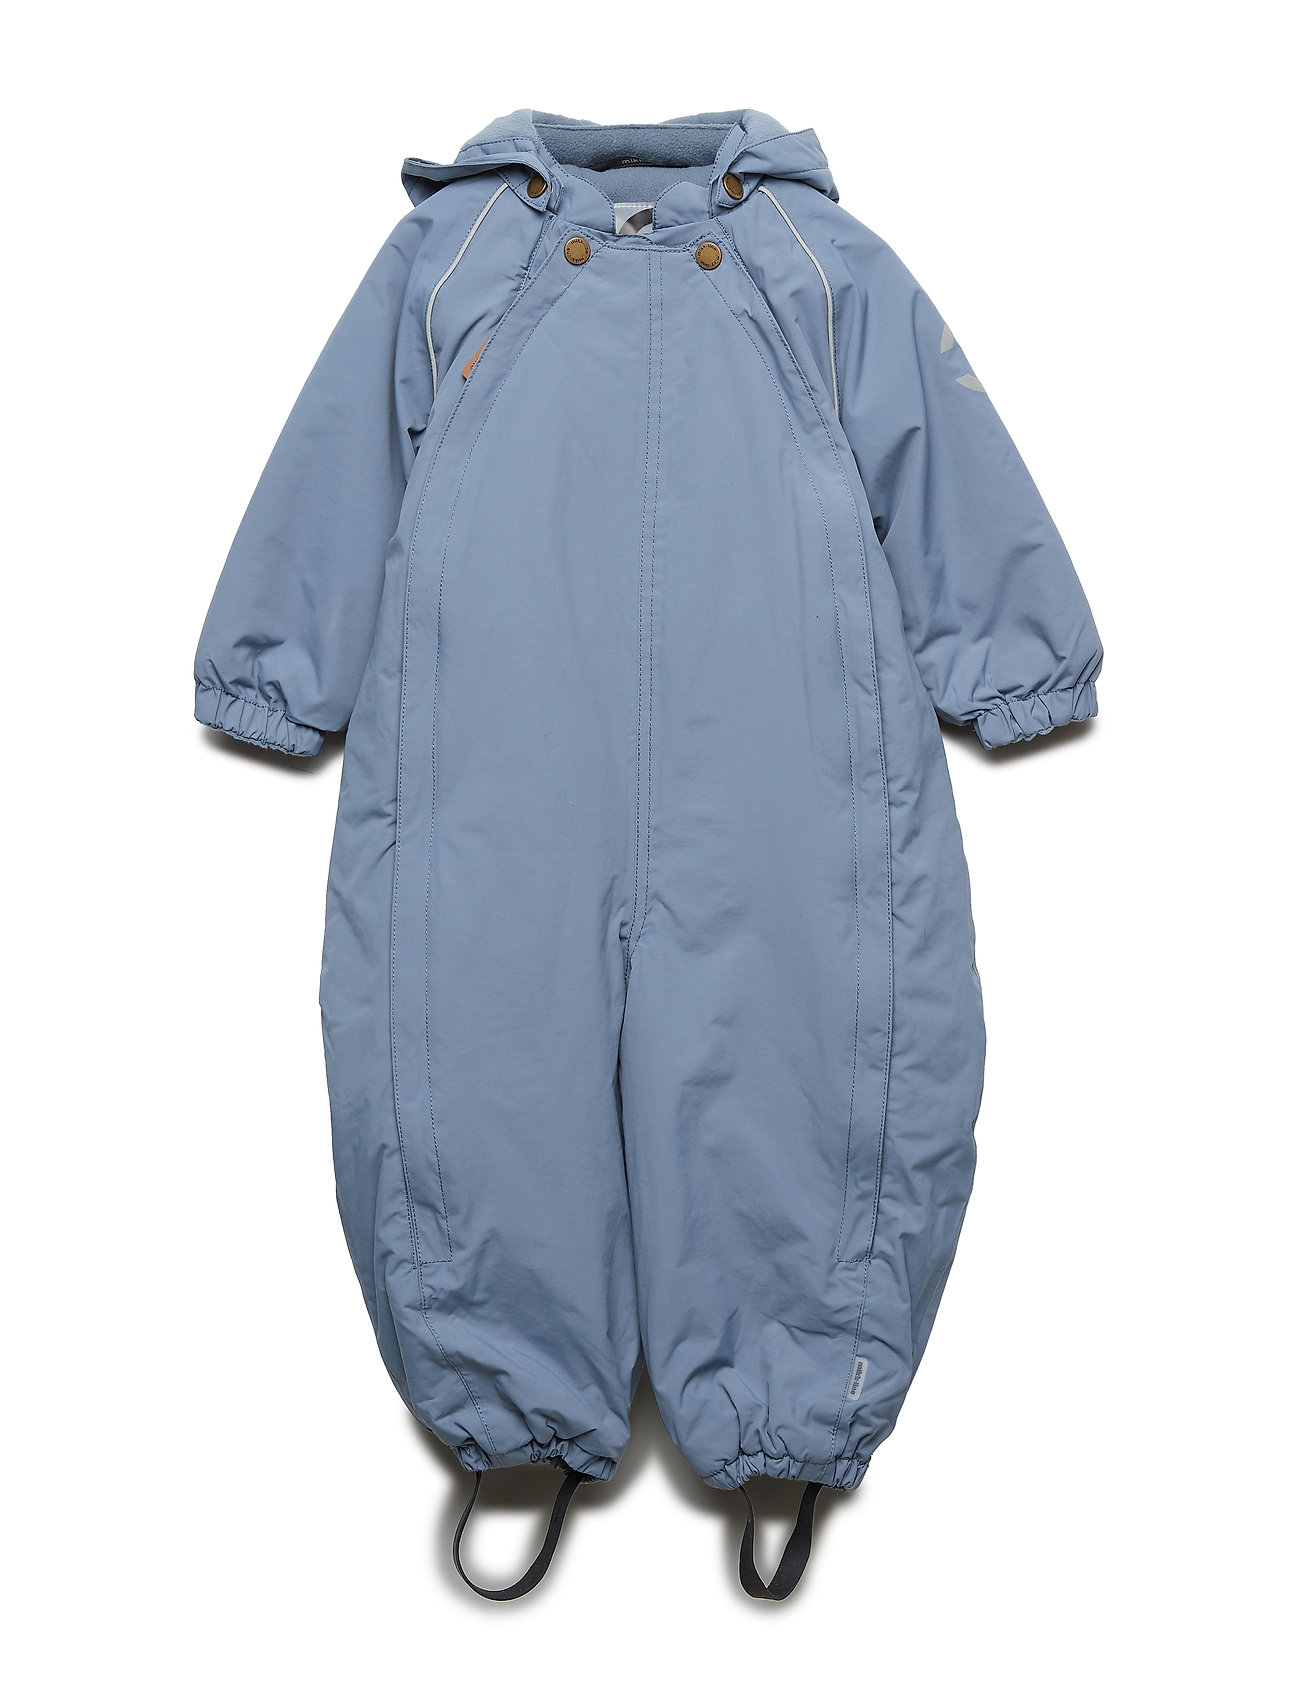 Mikk-Line Nylon Baby suit - CHINA BLUE